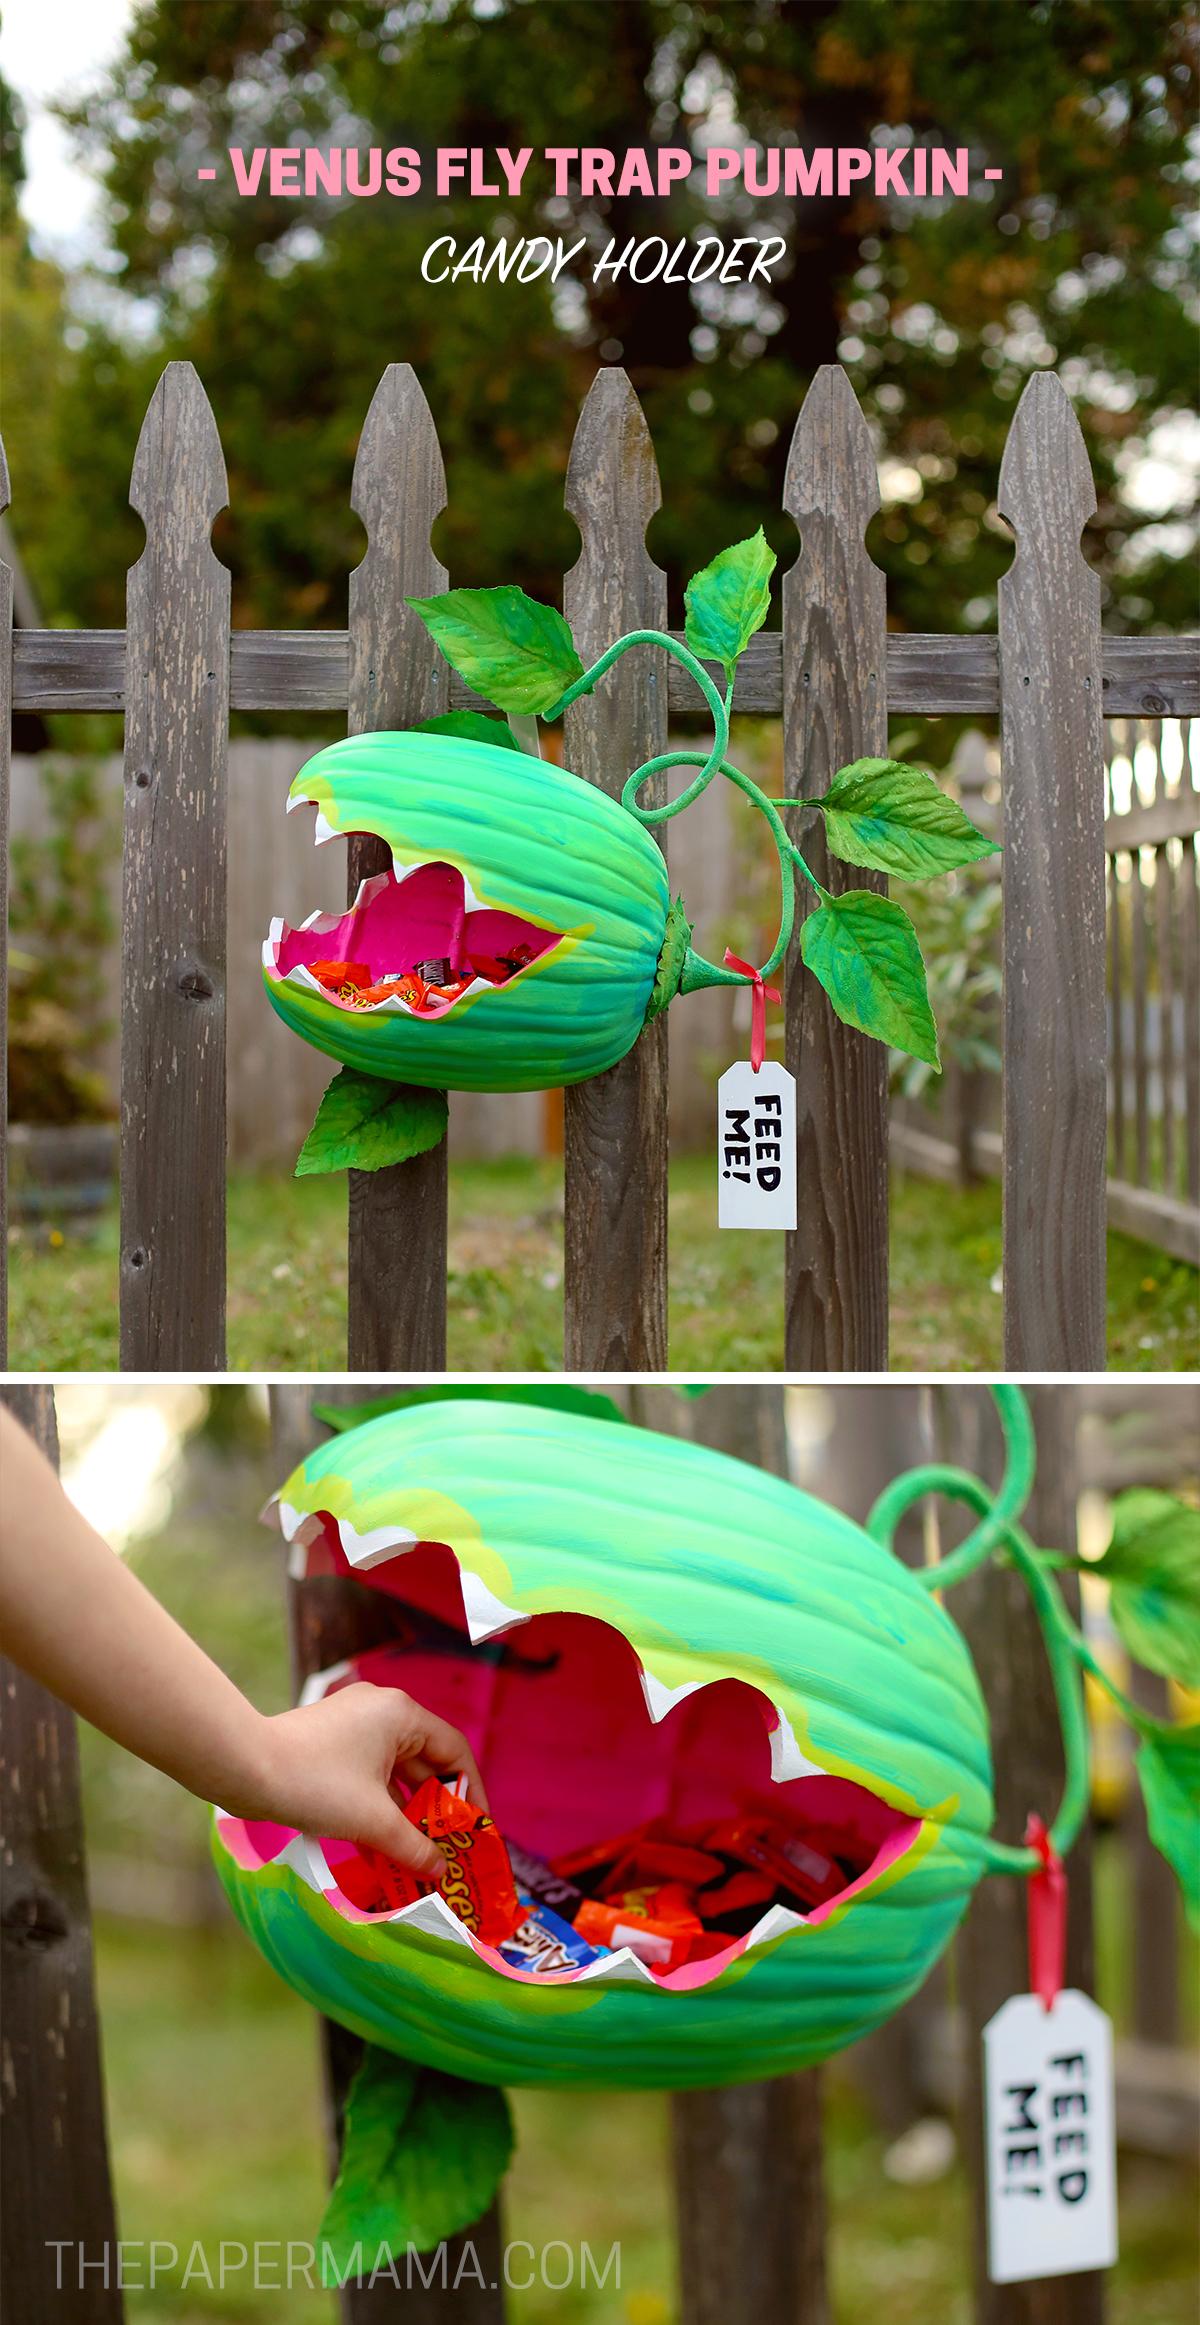 Venus Fly Trap Pumpkin Candy Holder Diy The Paper Mama